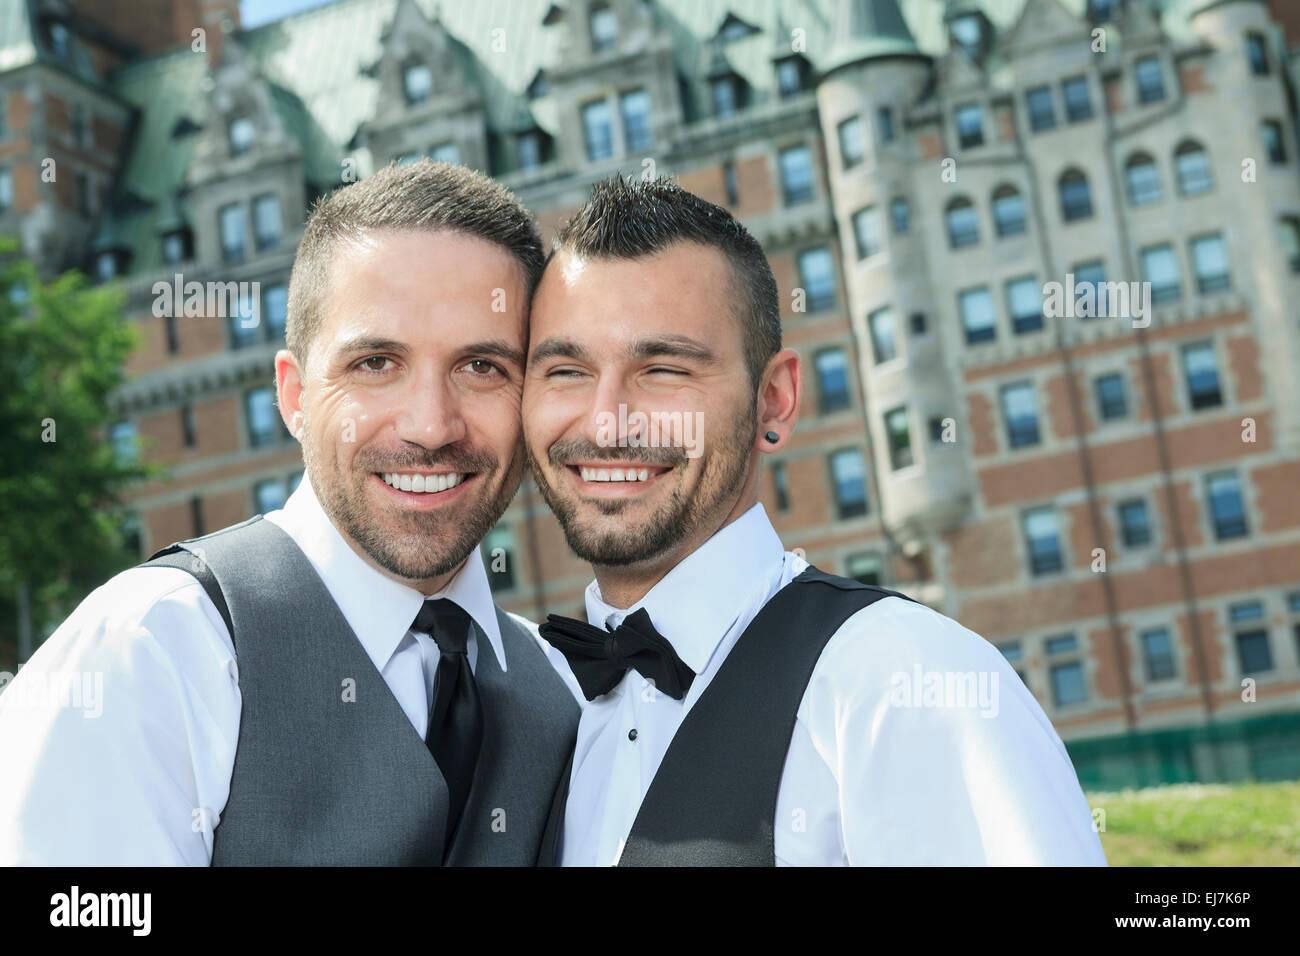 loving a gay husband